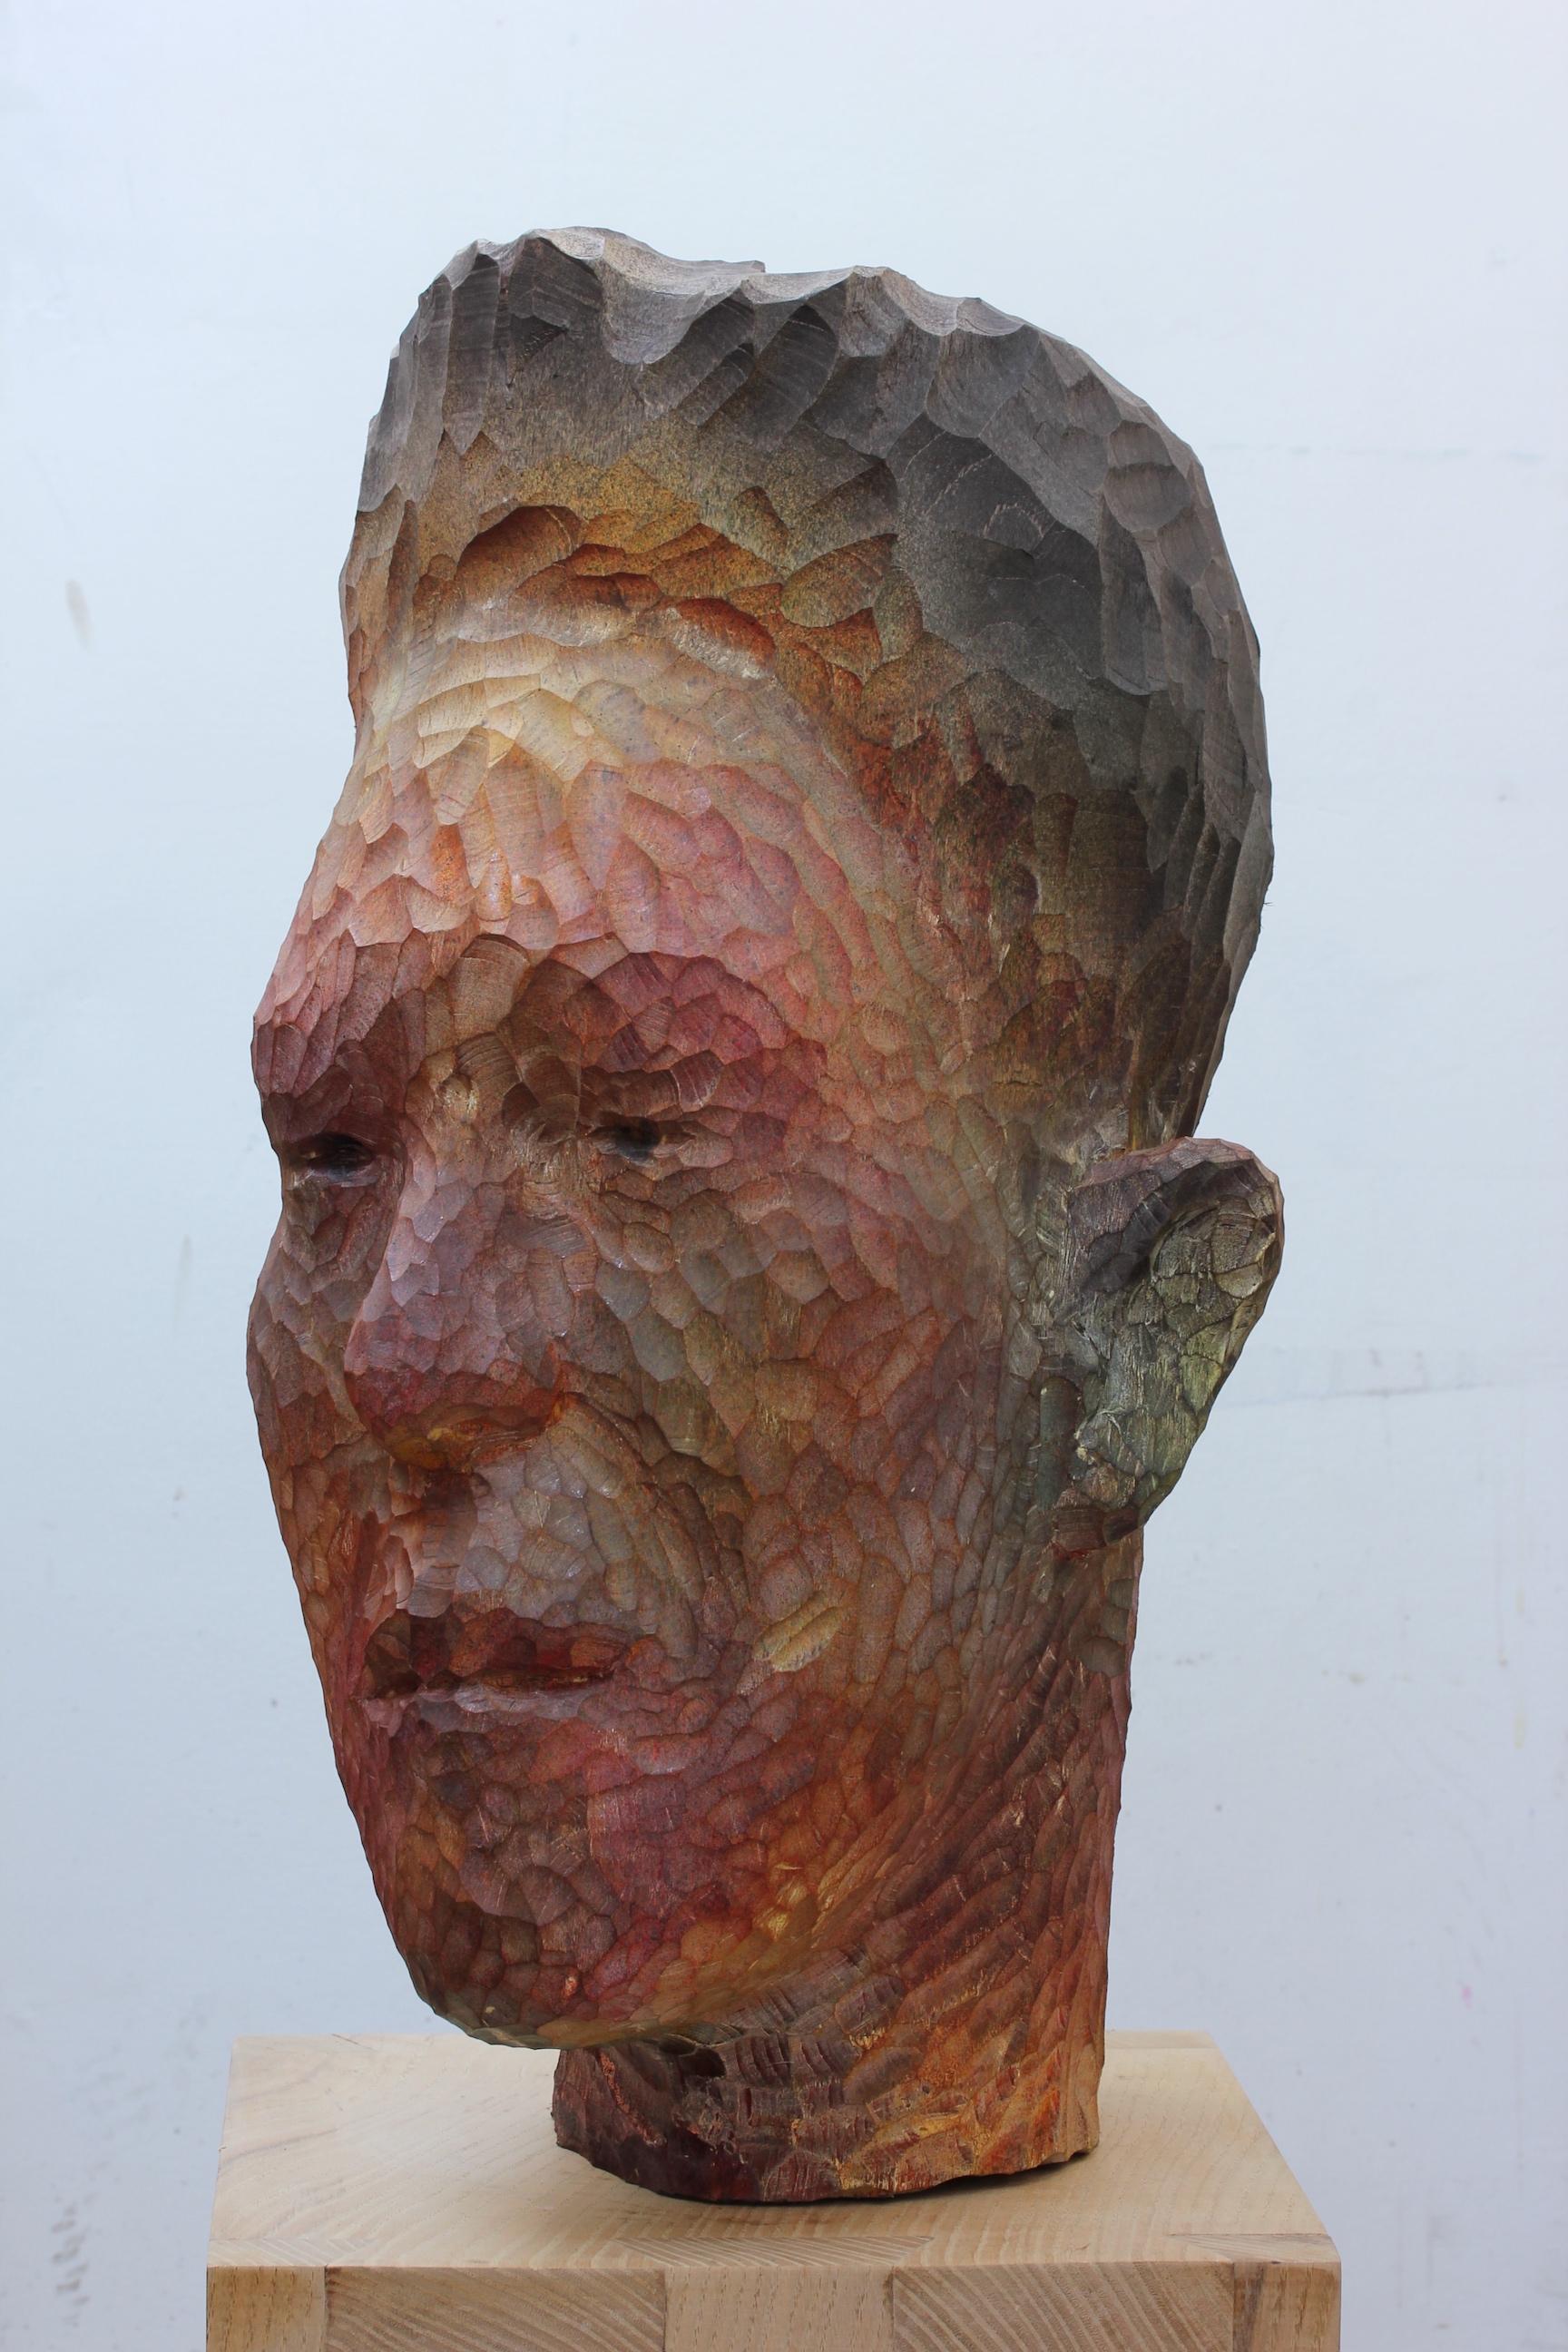 KEVIN DAGG, The Poser, Commendation, SPA Fine Art 2018